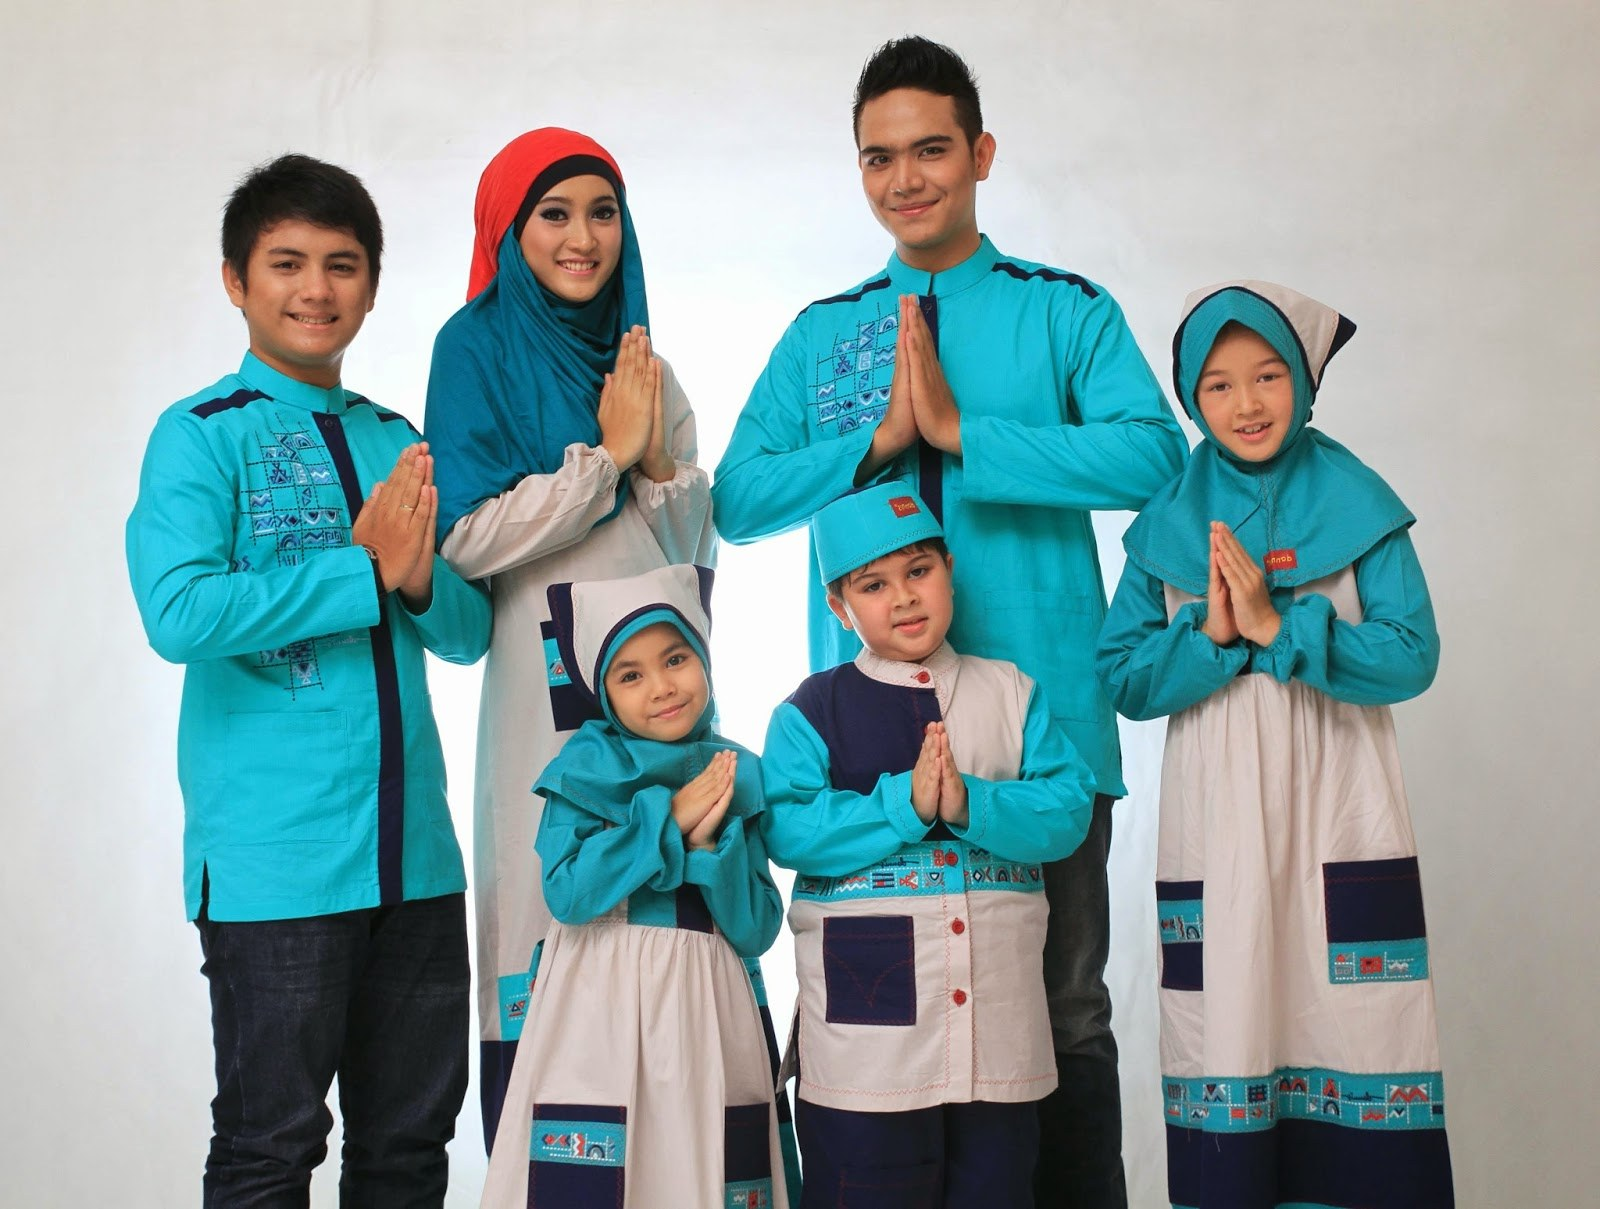 Bentuk Model Baju Lebaran Muslim Terbaru S5d8 Model Busana Muslim Terbaru 2015